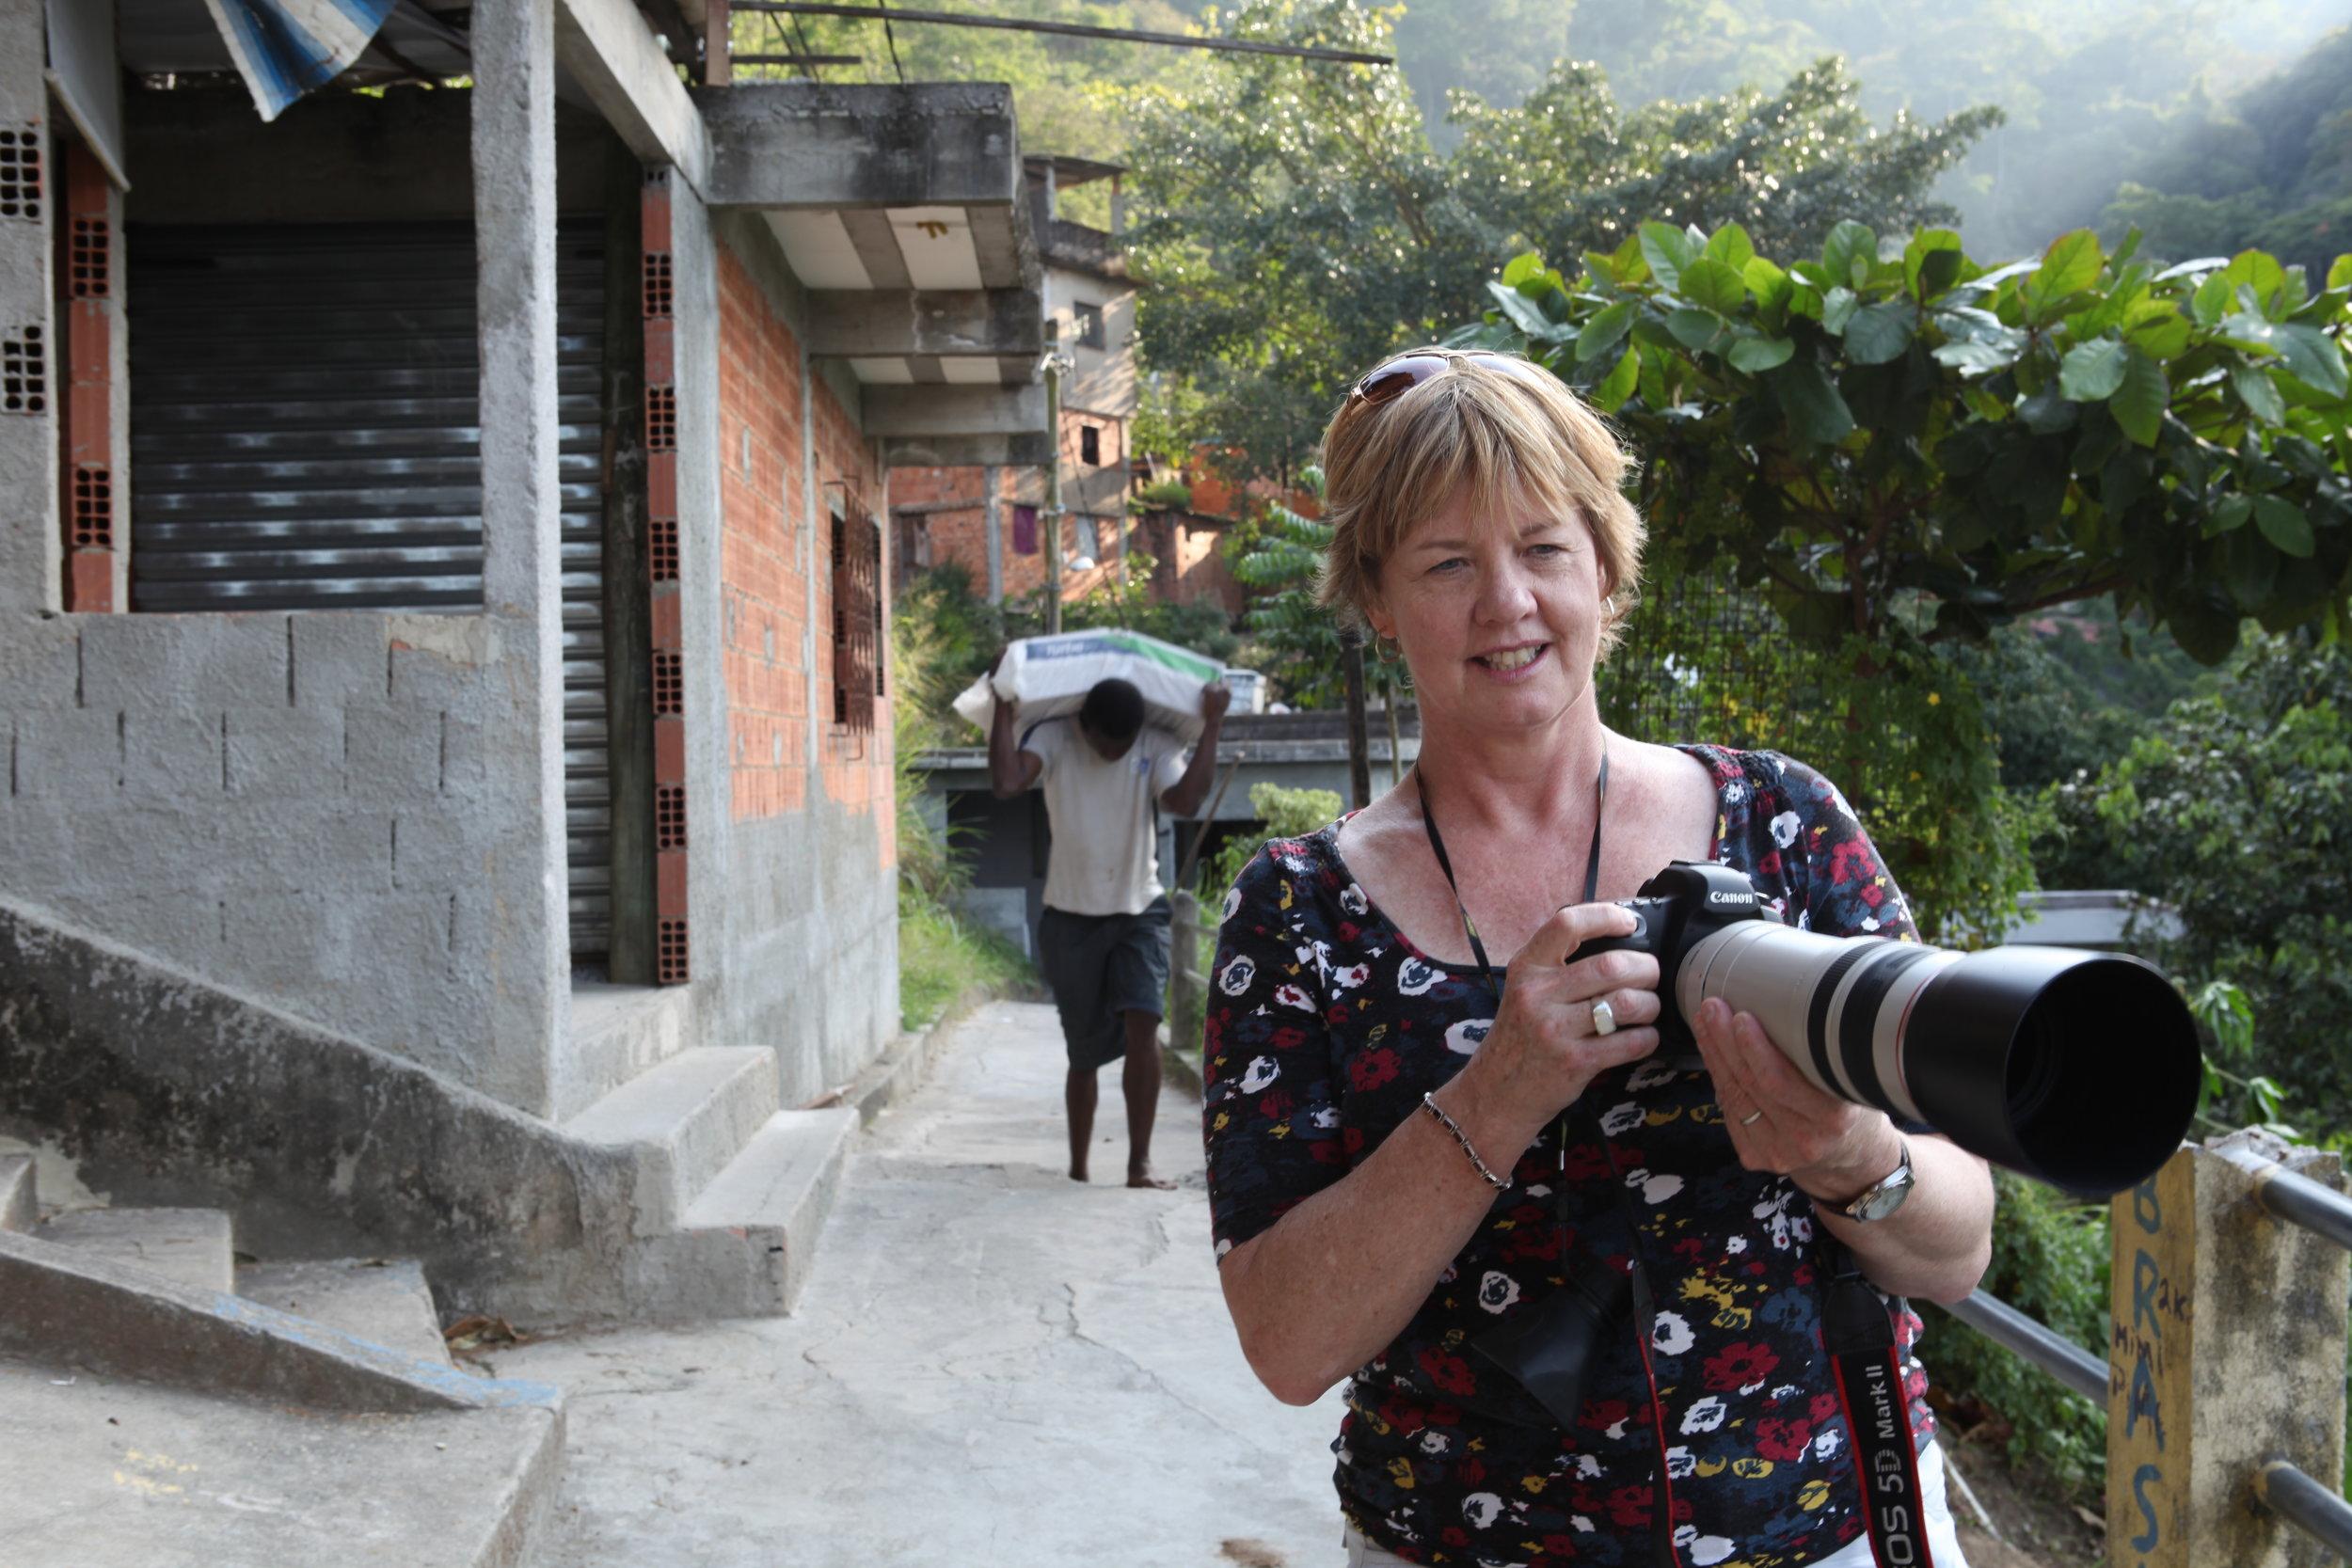 Rio favelas-shooting for a Humanitarian organisation